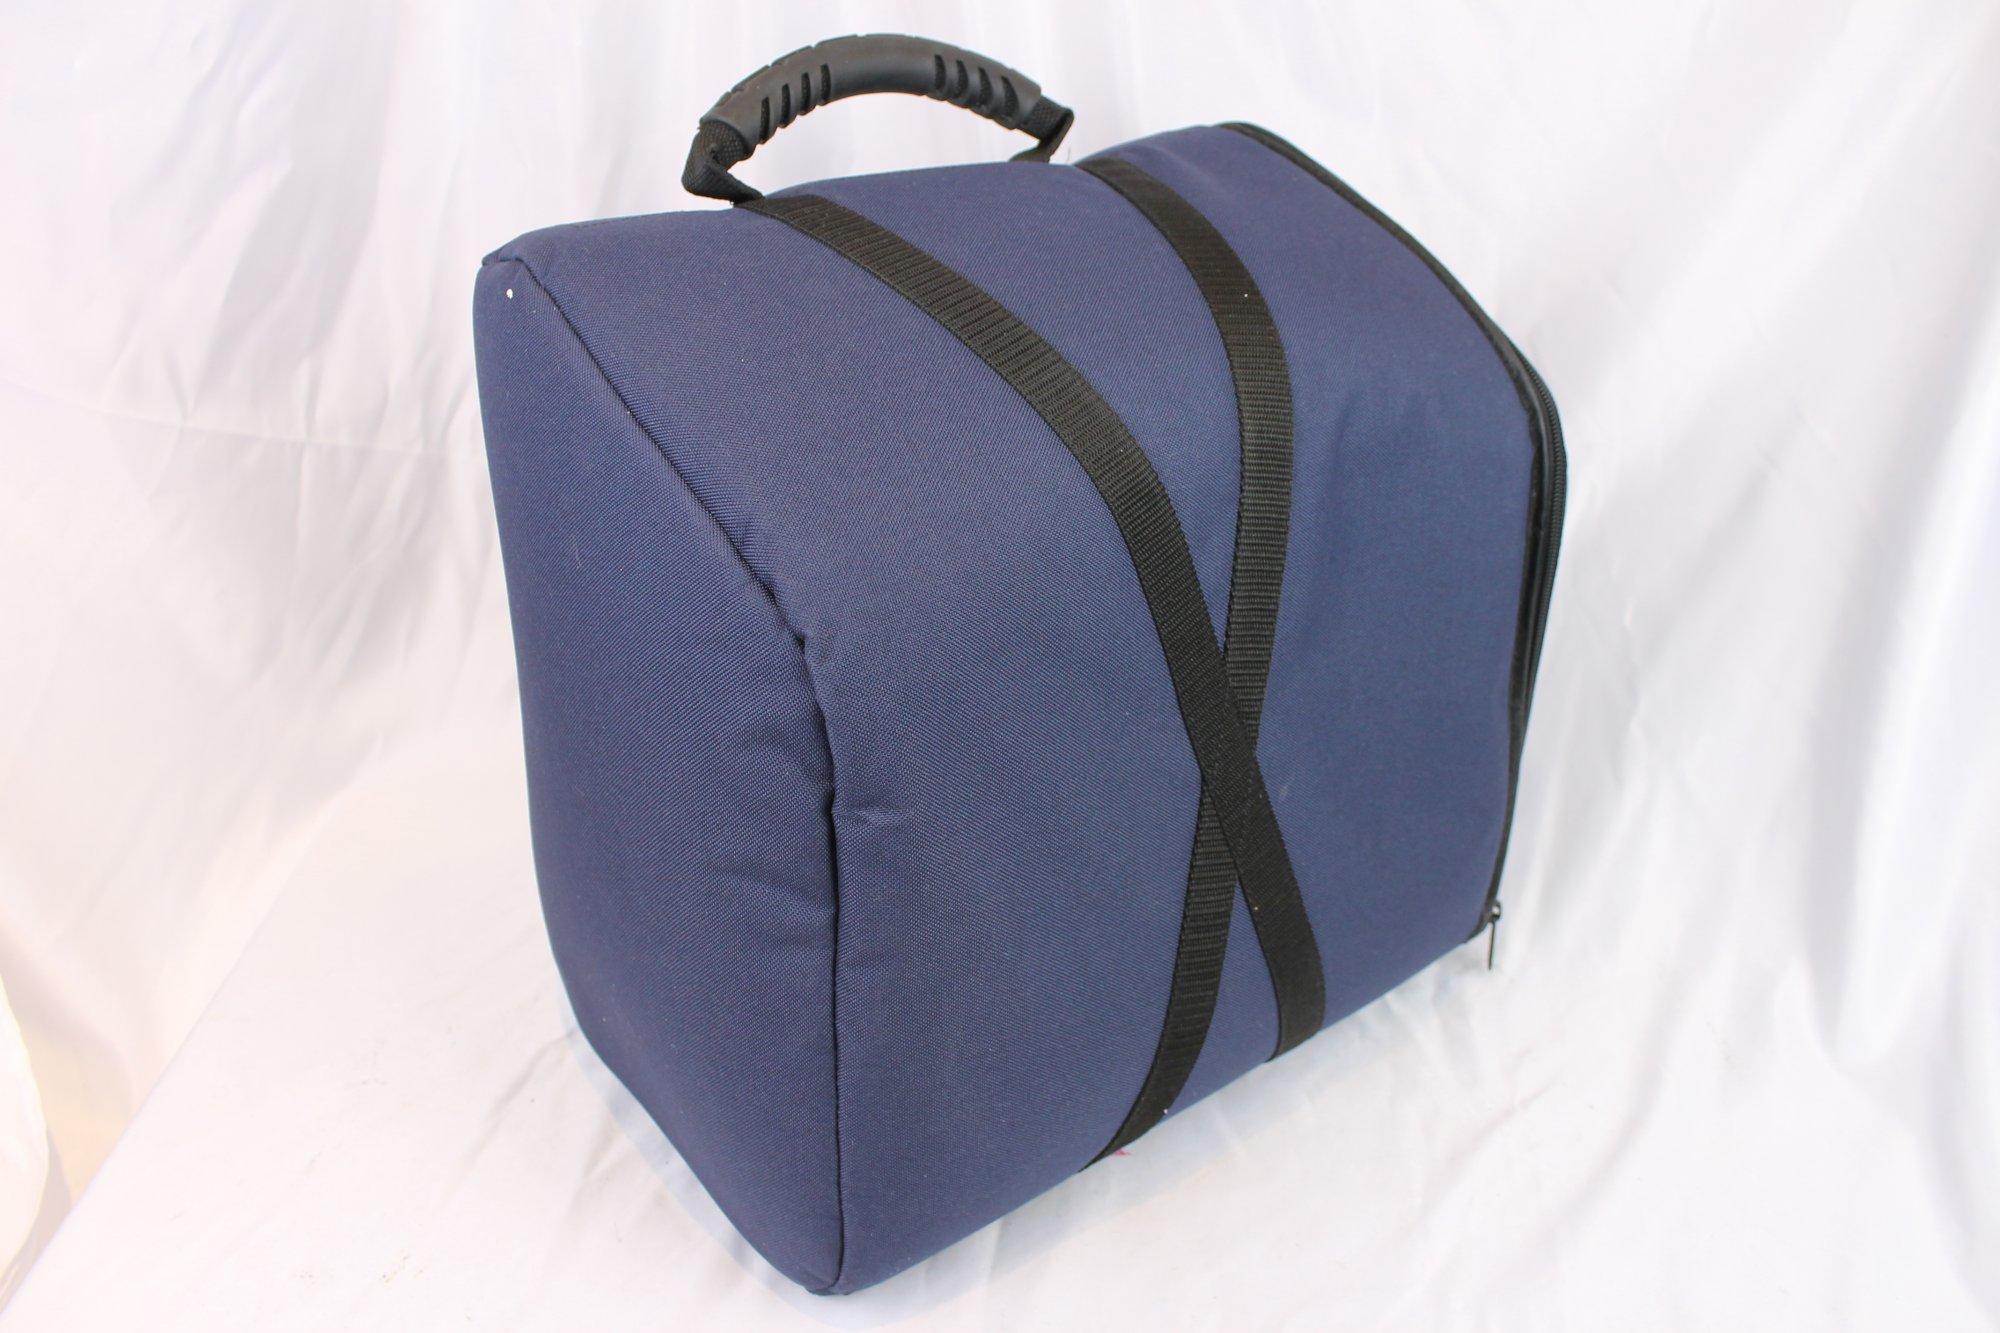 Blue Gig Bag for Accordion 13 x 14 x 8